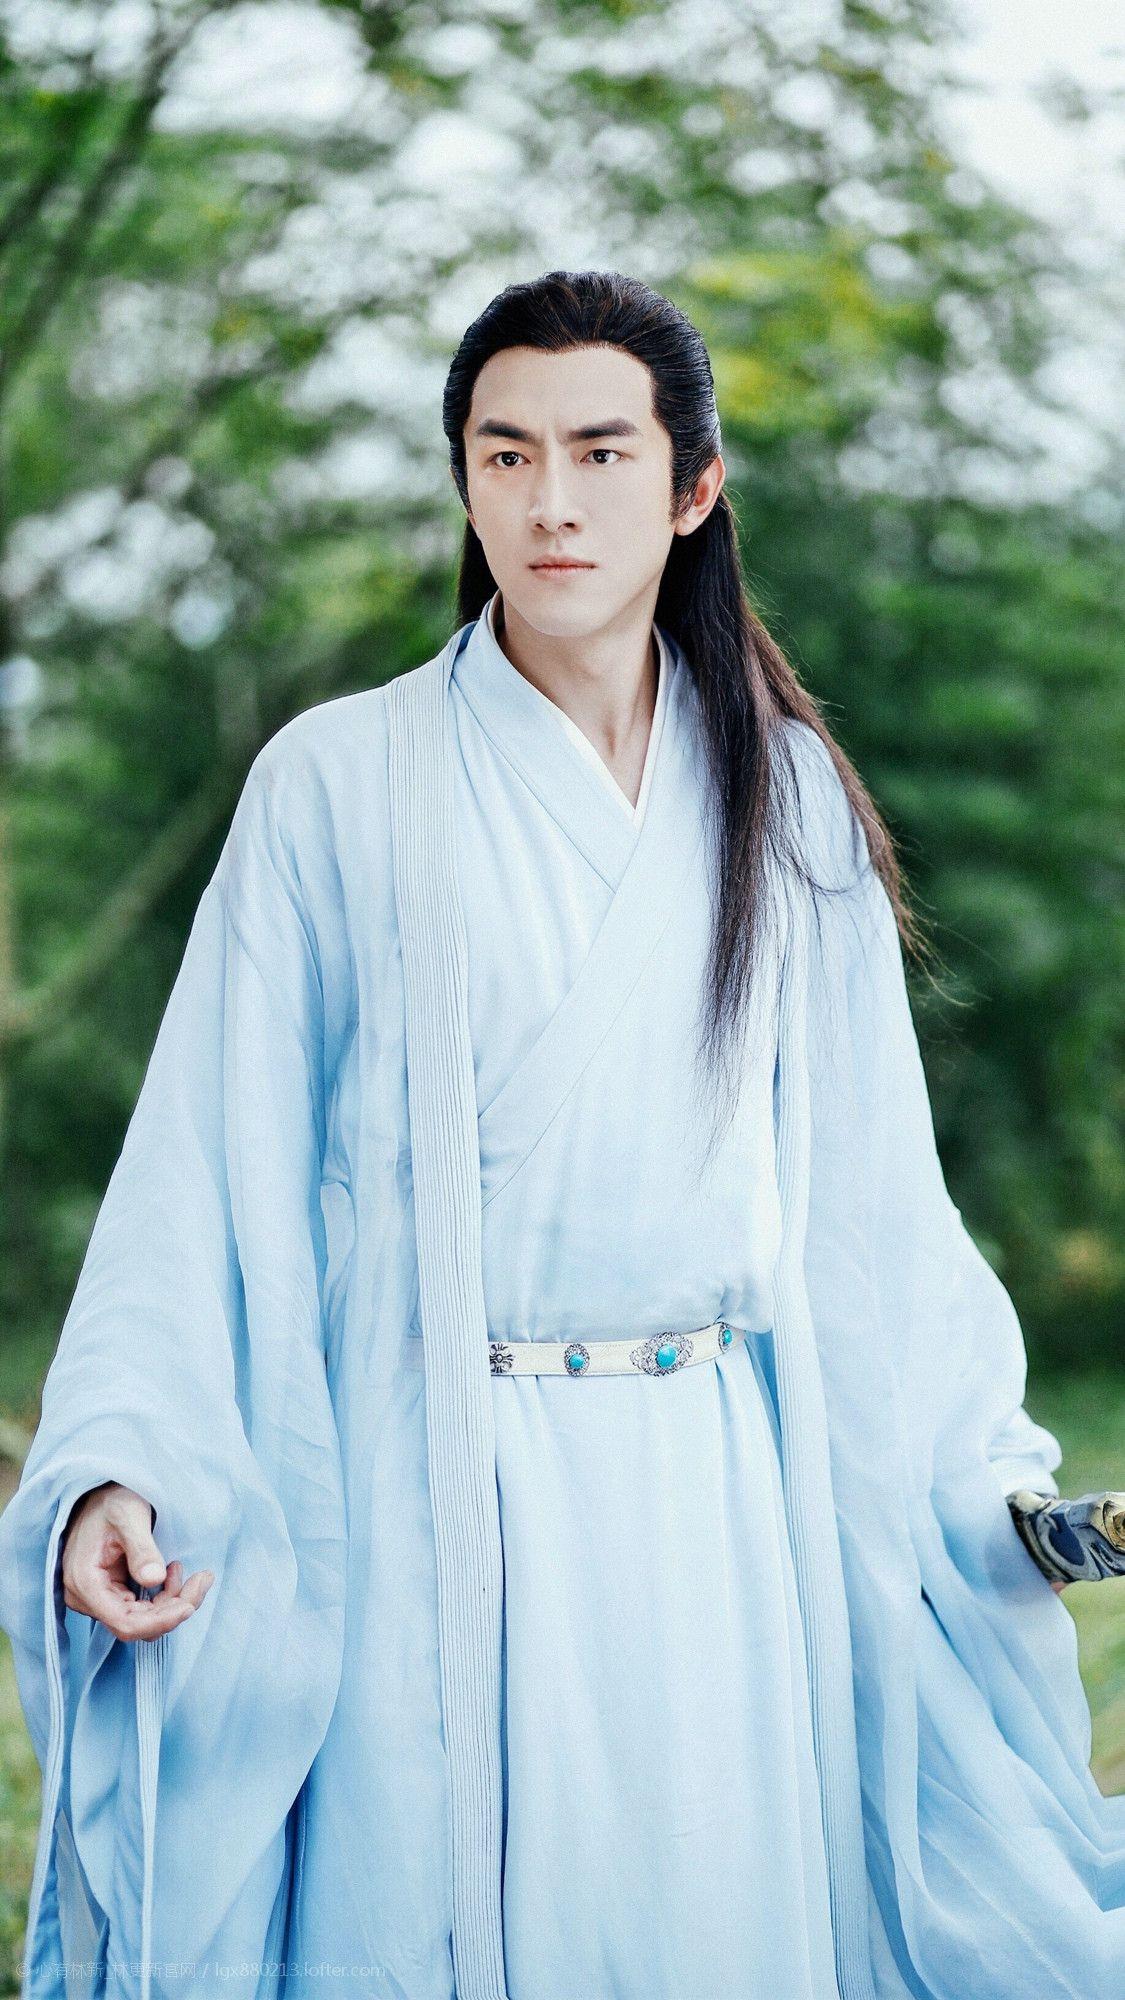 Tokoh Yuwen Yue dalam serial drama Princess Agents - Picture taken from Pinterest.com